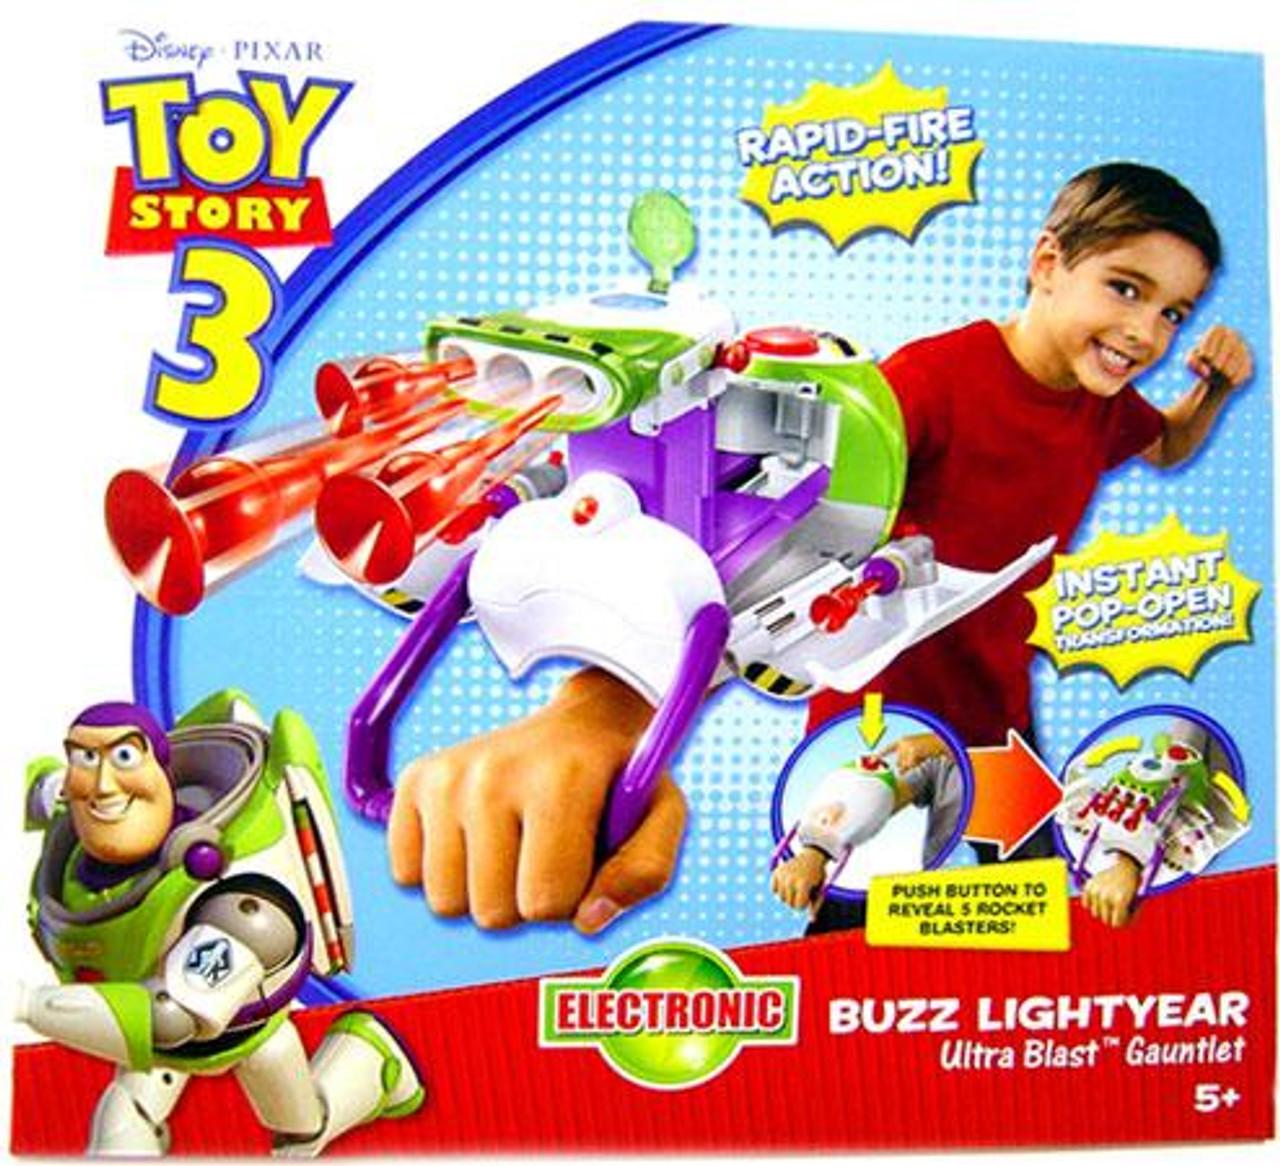 Toy Story 3 Buzz Lightyear Ultra Blast Gauntlet Roleplay Toy